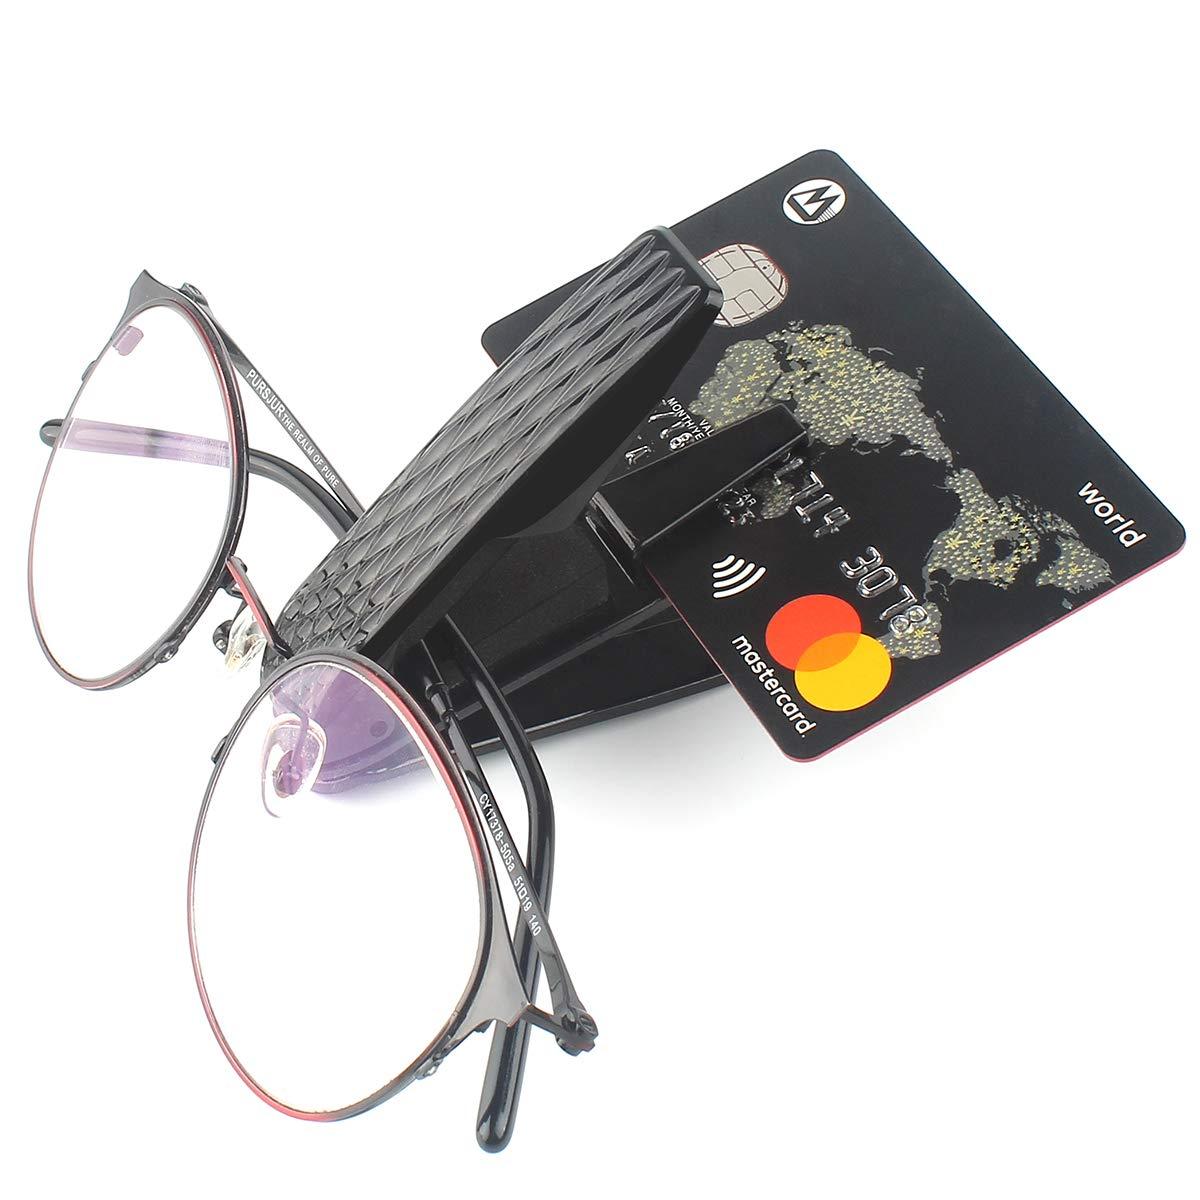 Premium Visor Eyeglass Clip 2Pack Double Layer Auto Sunglasses Holder Clip for Cars Vehicles Sun Visor KMMIN Car Sunglass Holder